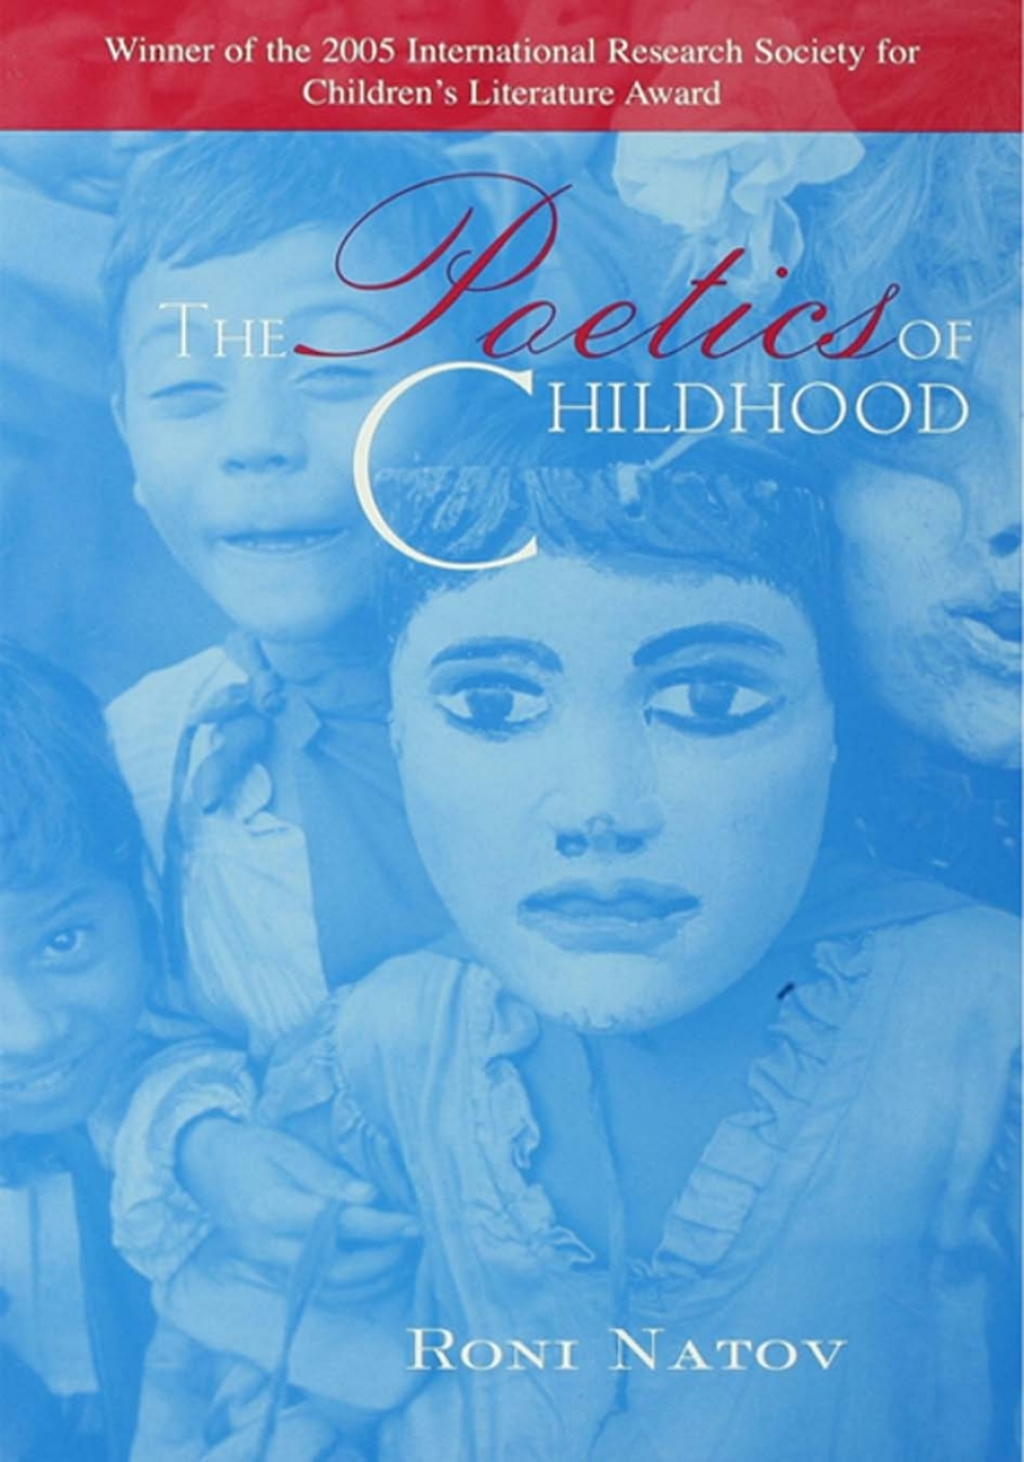 The Poetics of Childhood (eBook Rental)